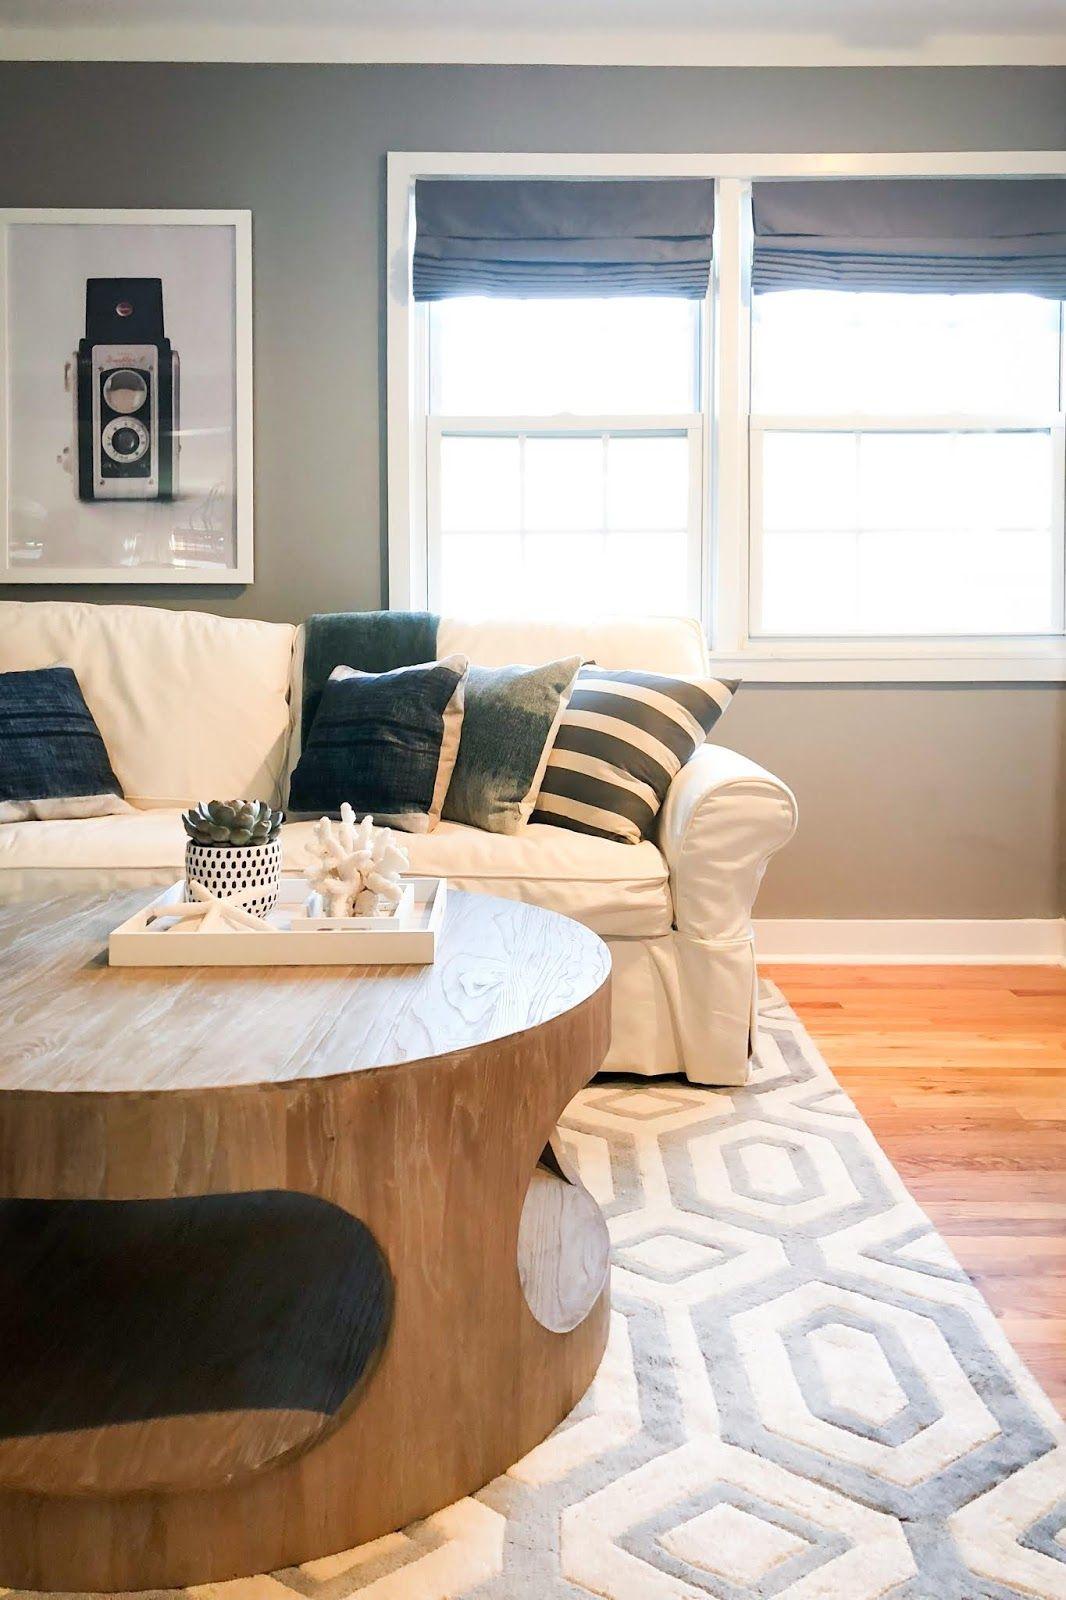 Brooklyn Limestone | Living room update, Decor design, Decor